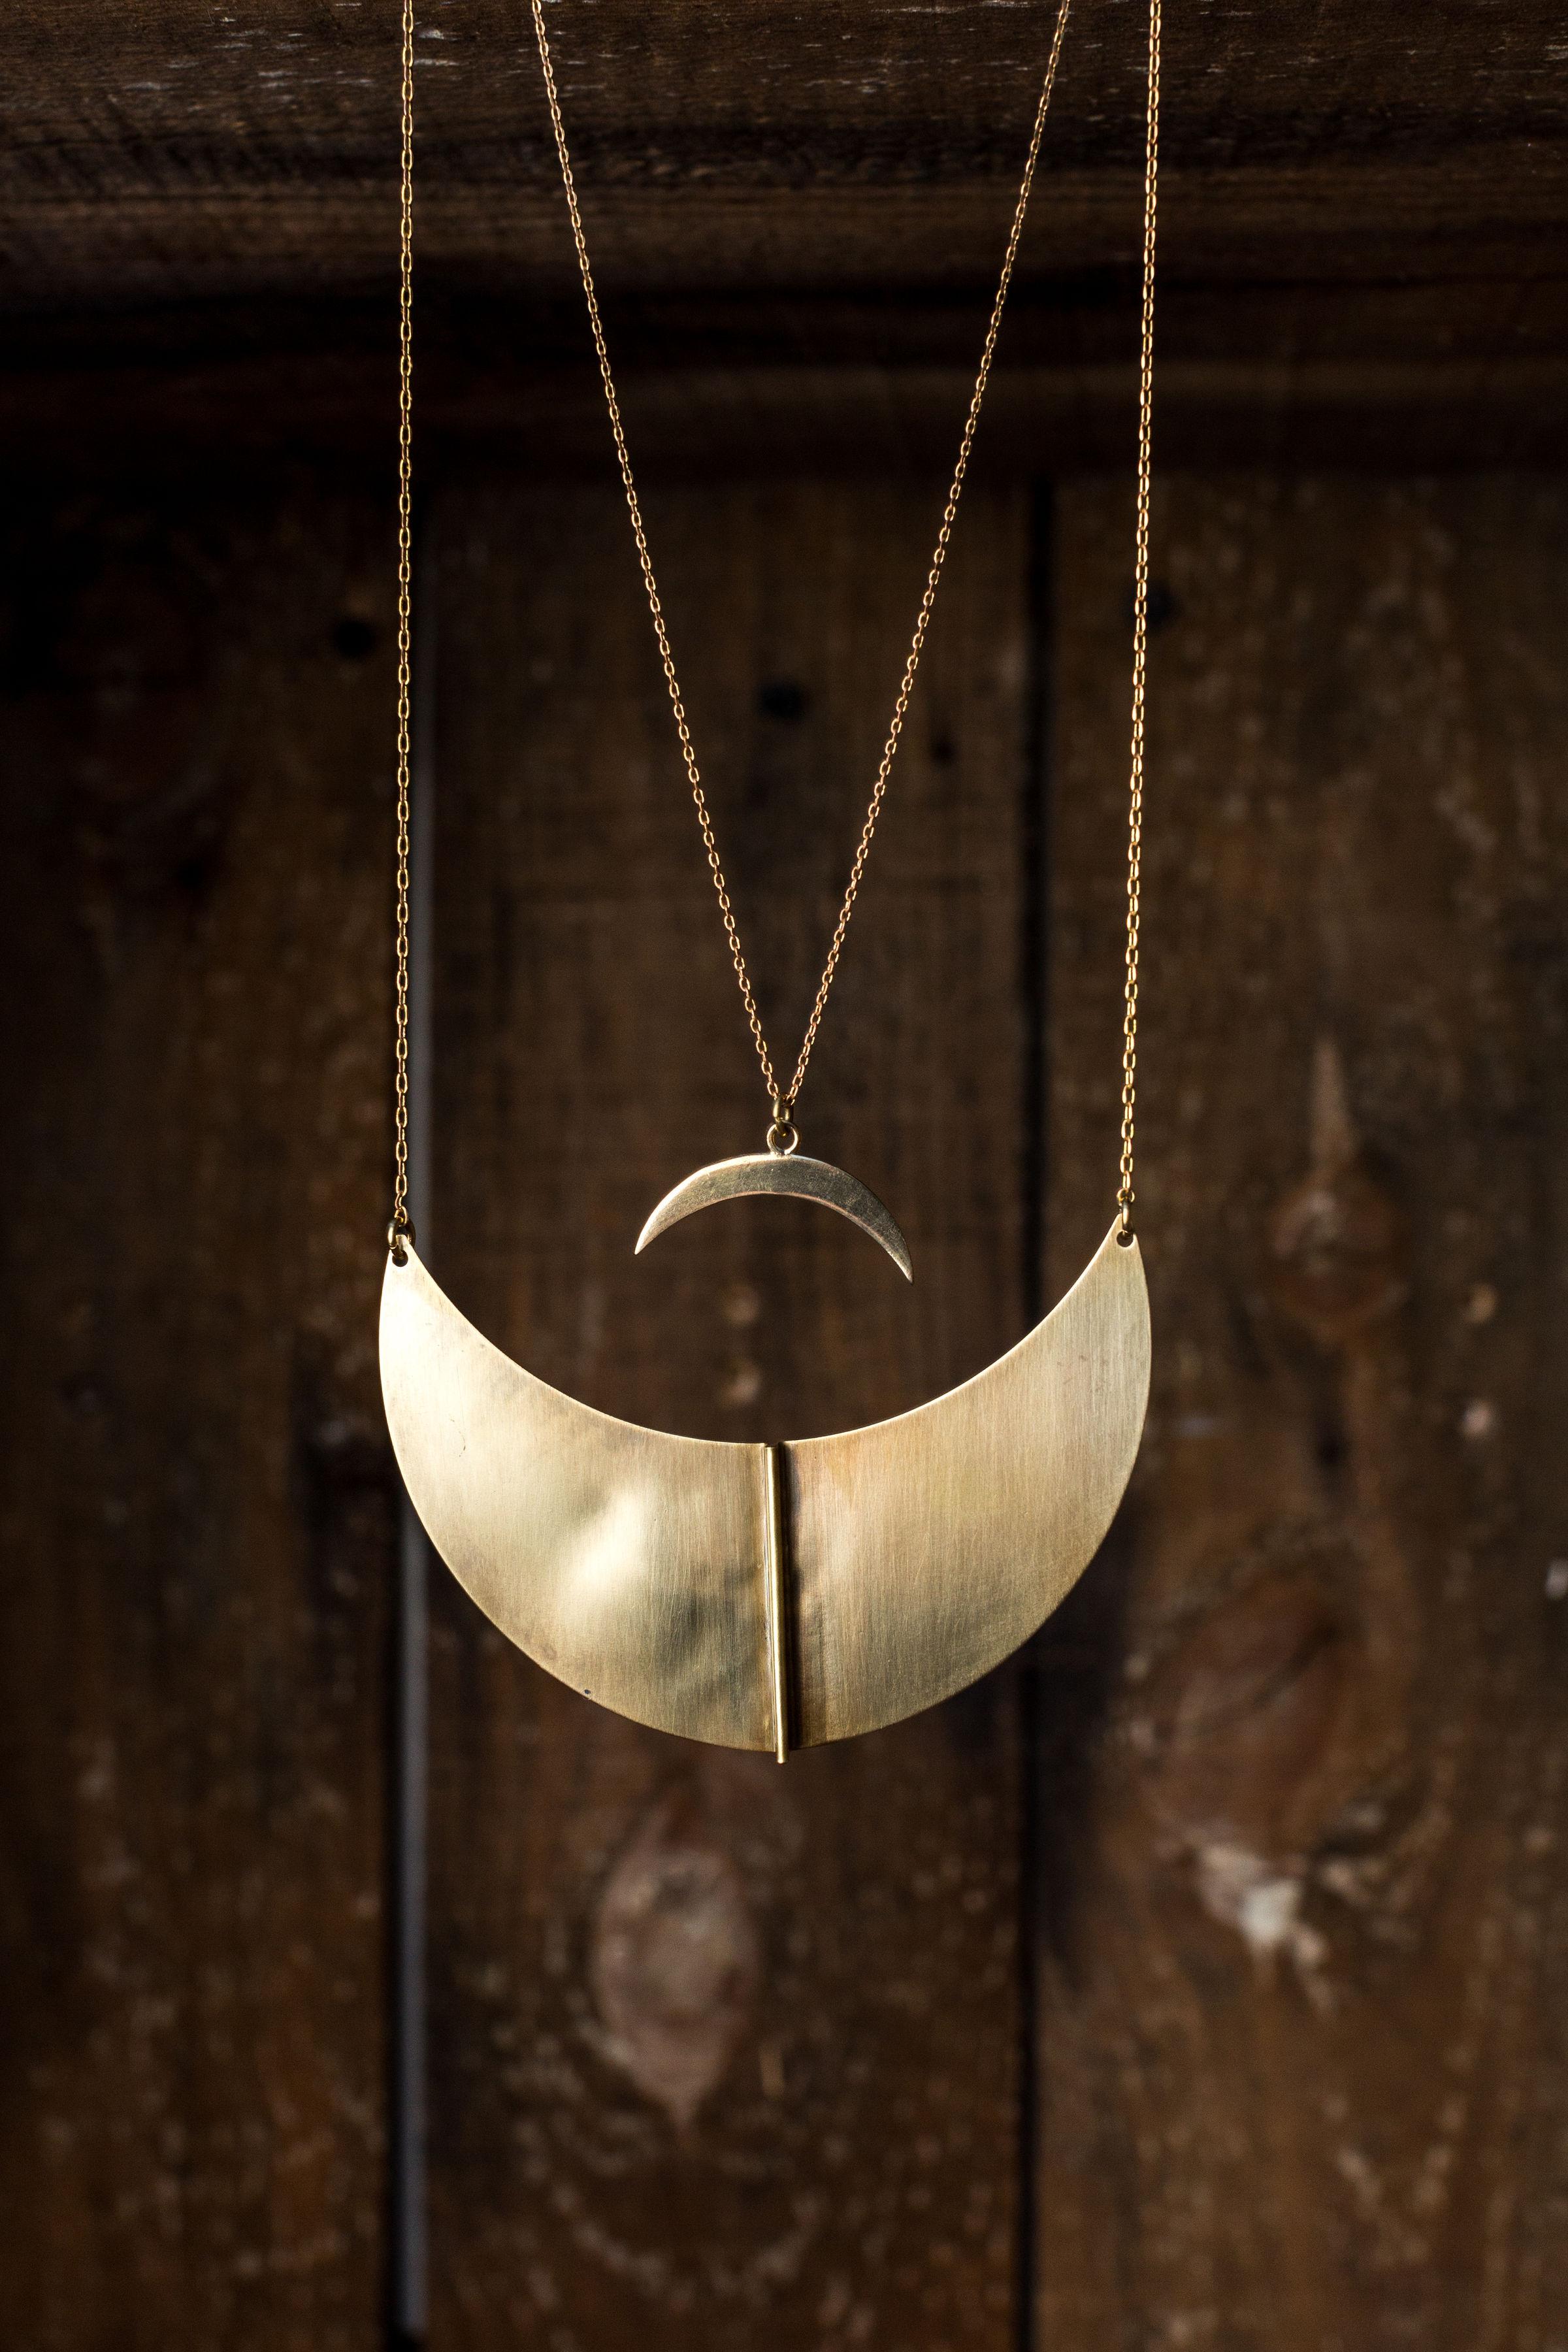 Handmade jewelry at Indigo Elephant